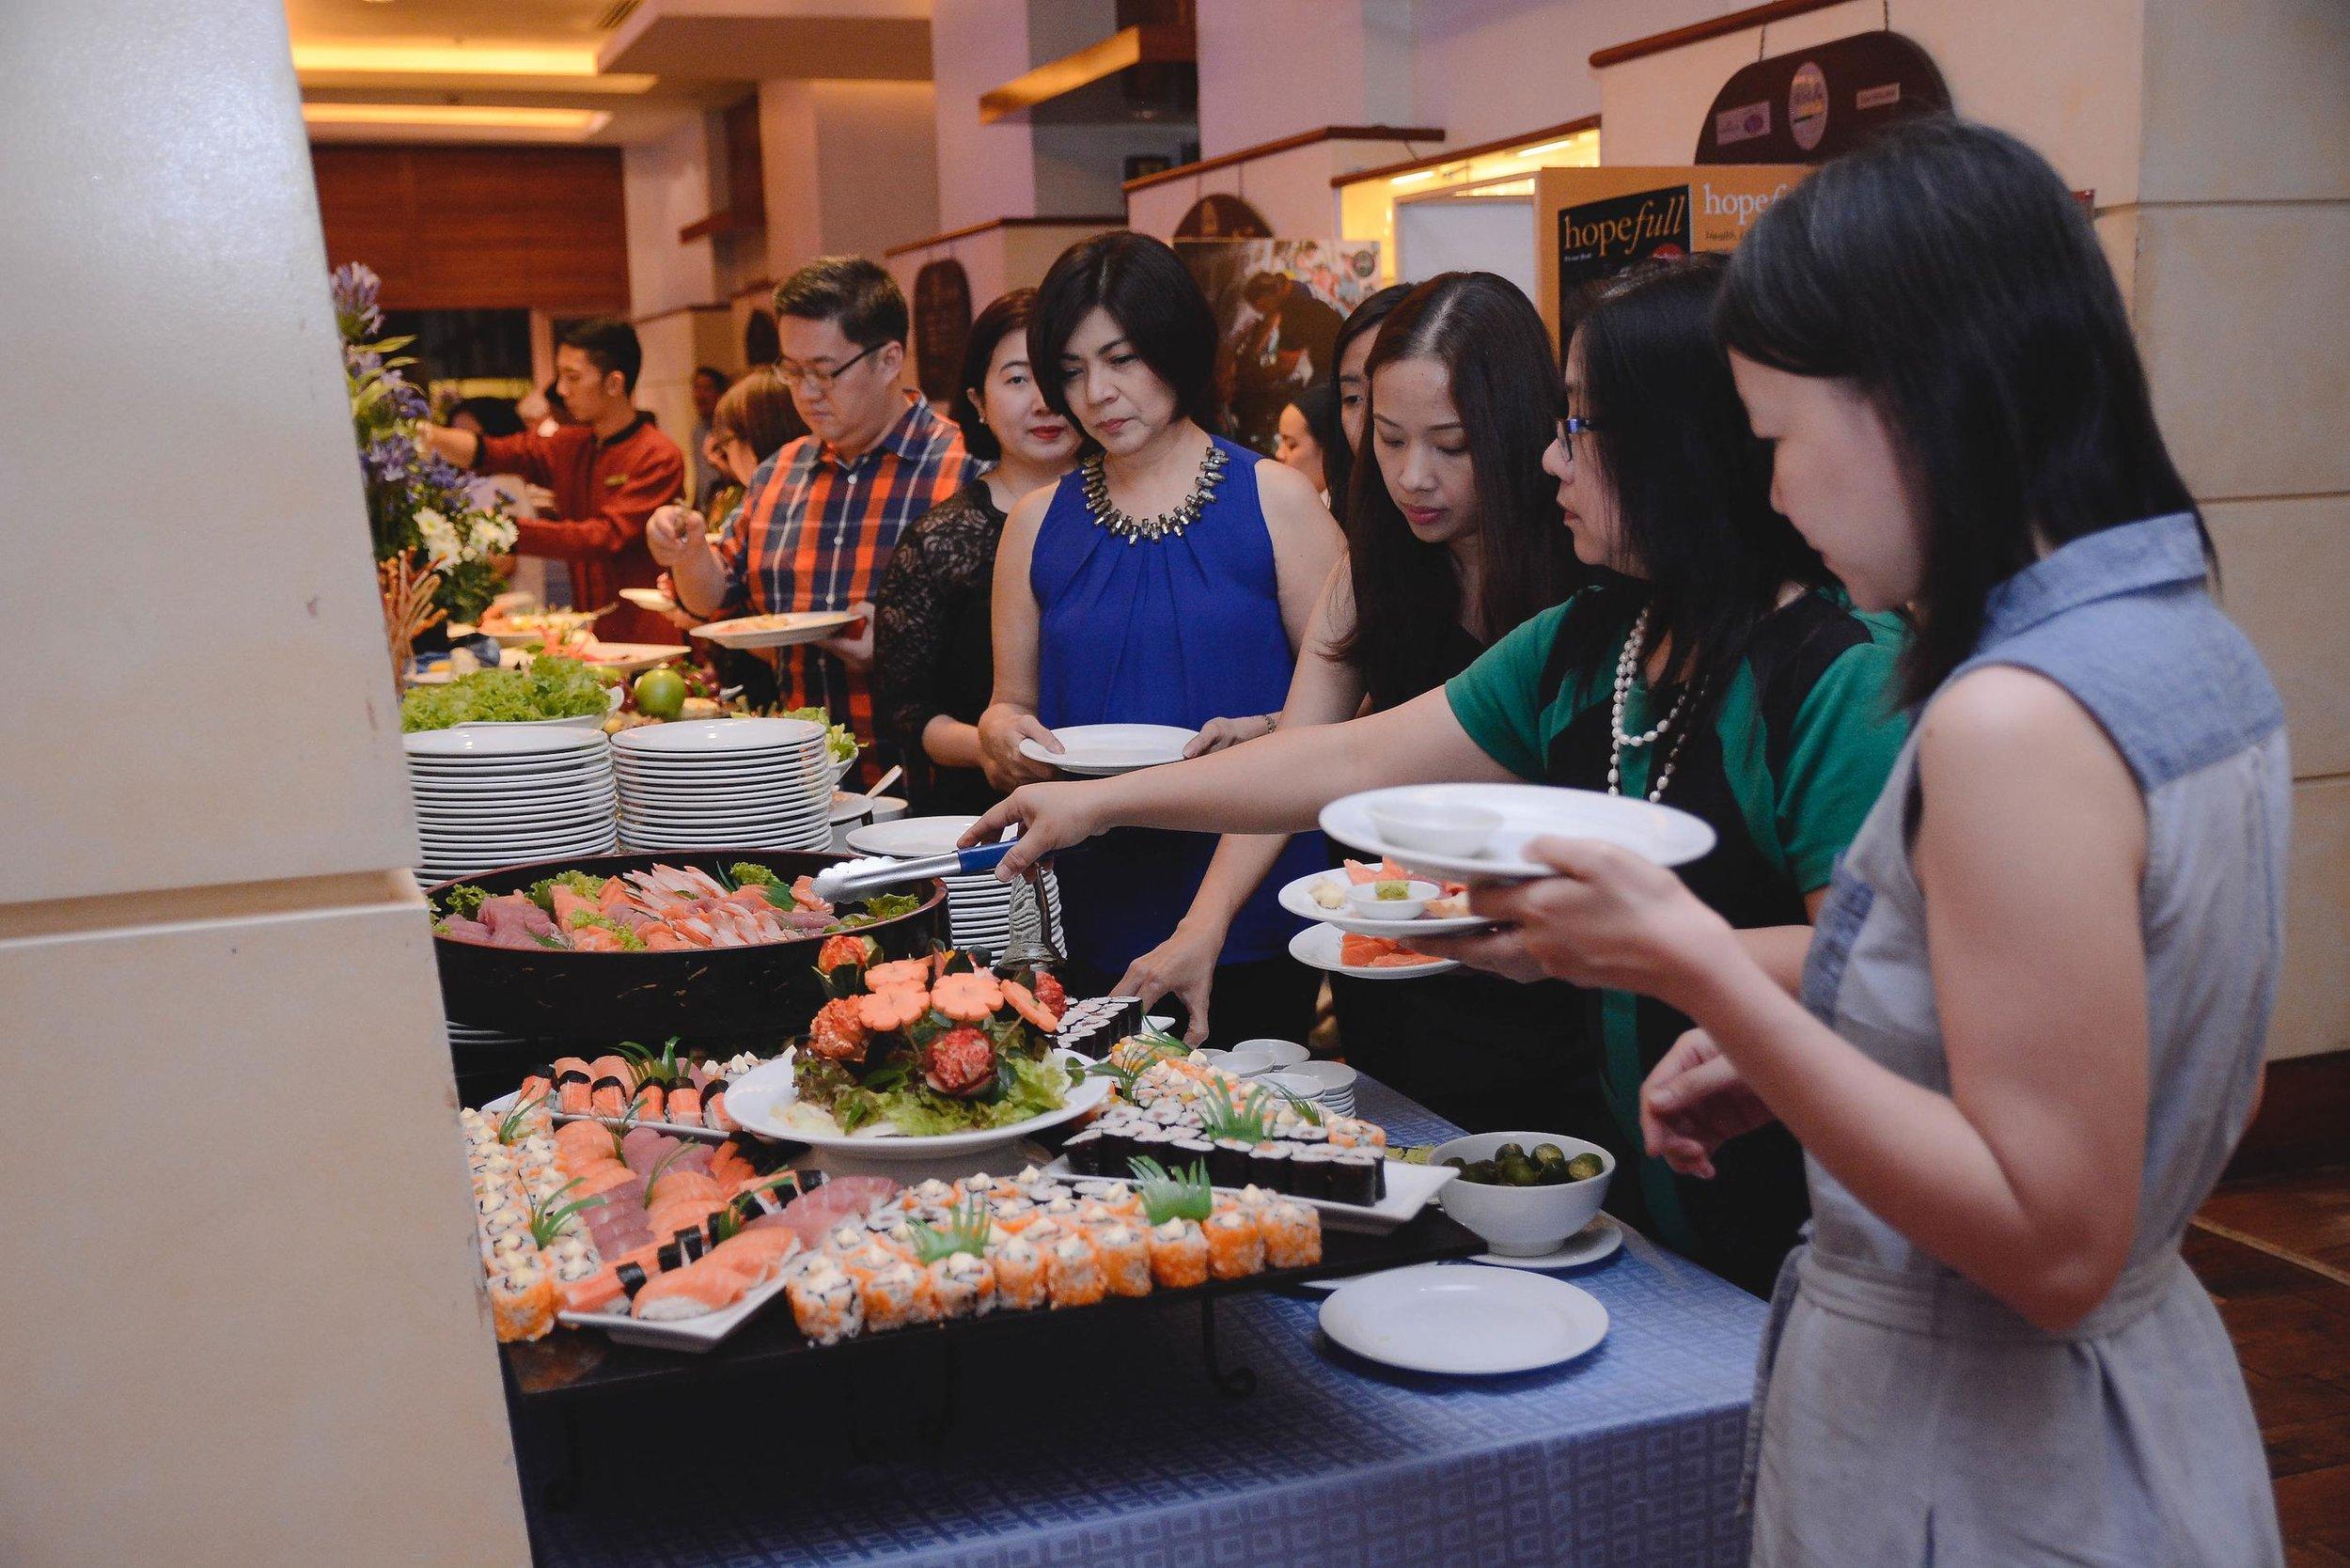 enjoying a sumptuous Japanese-themed dinner spread